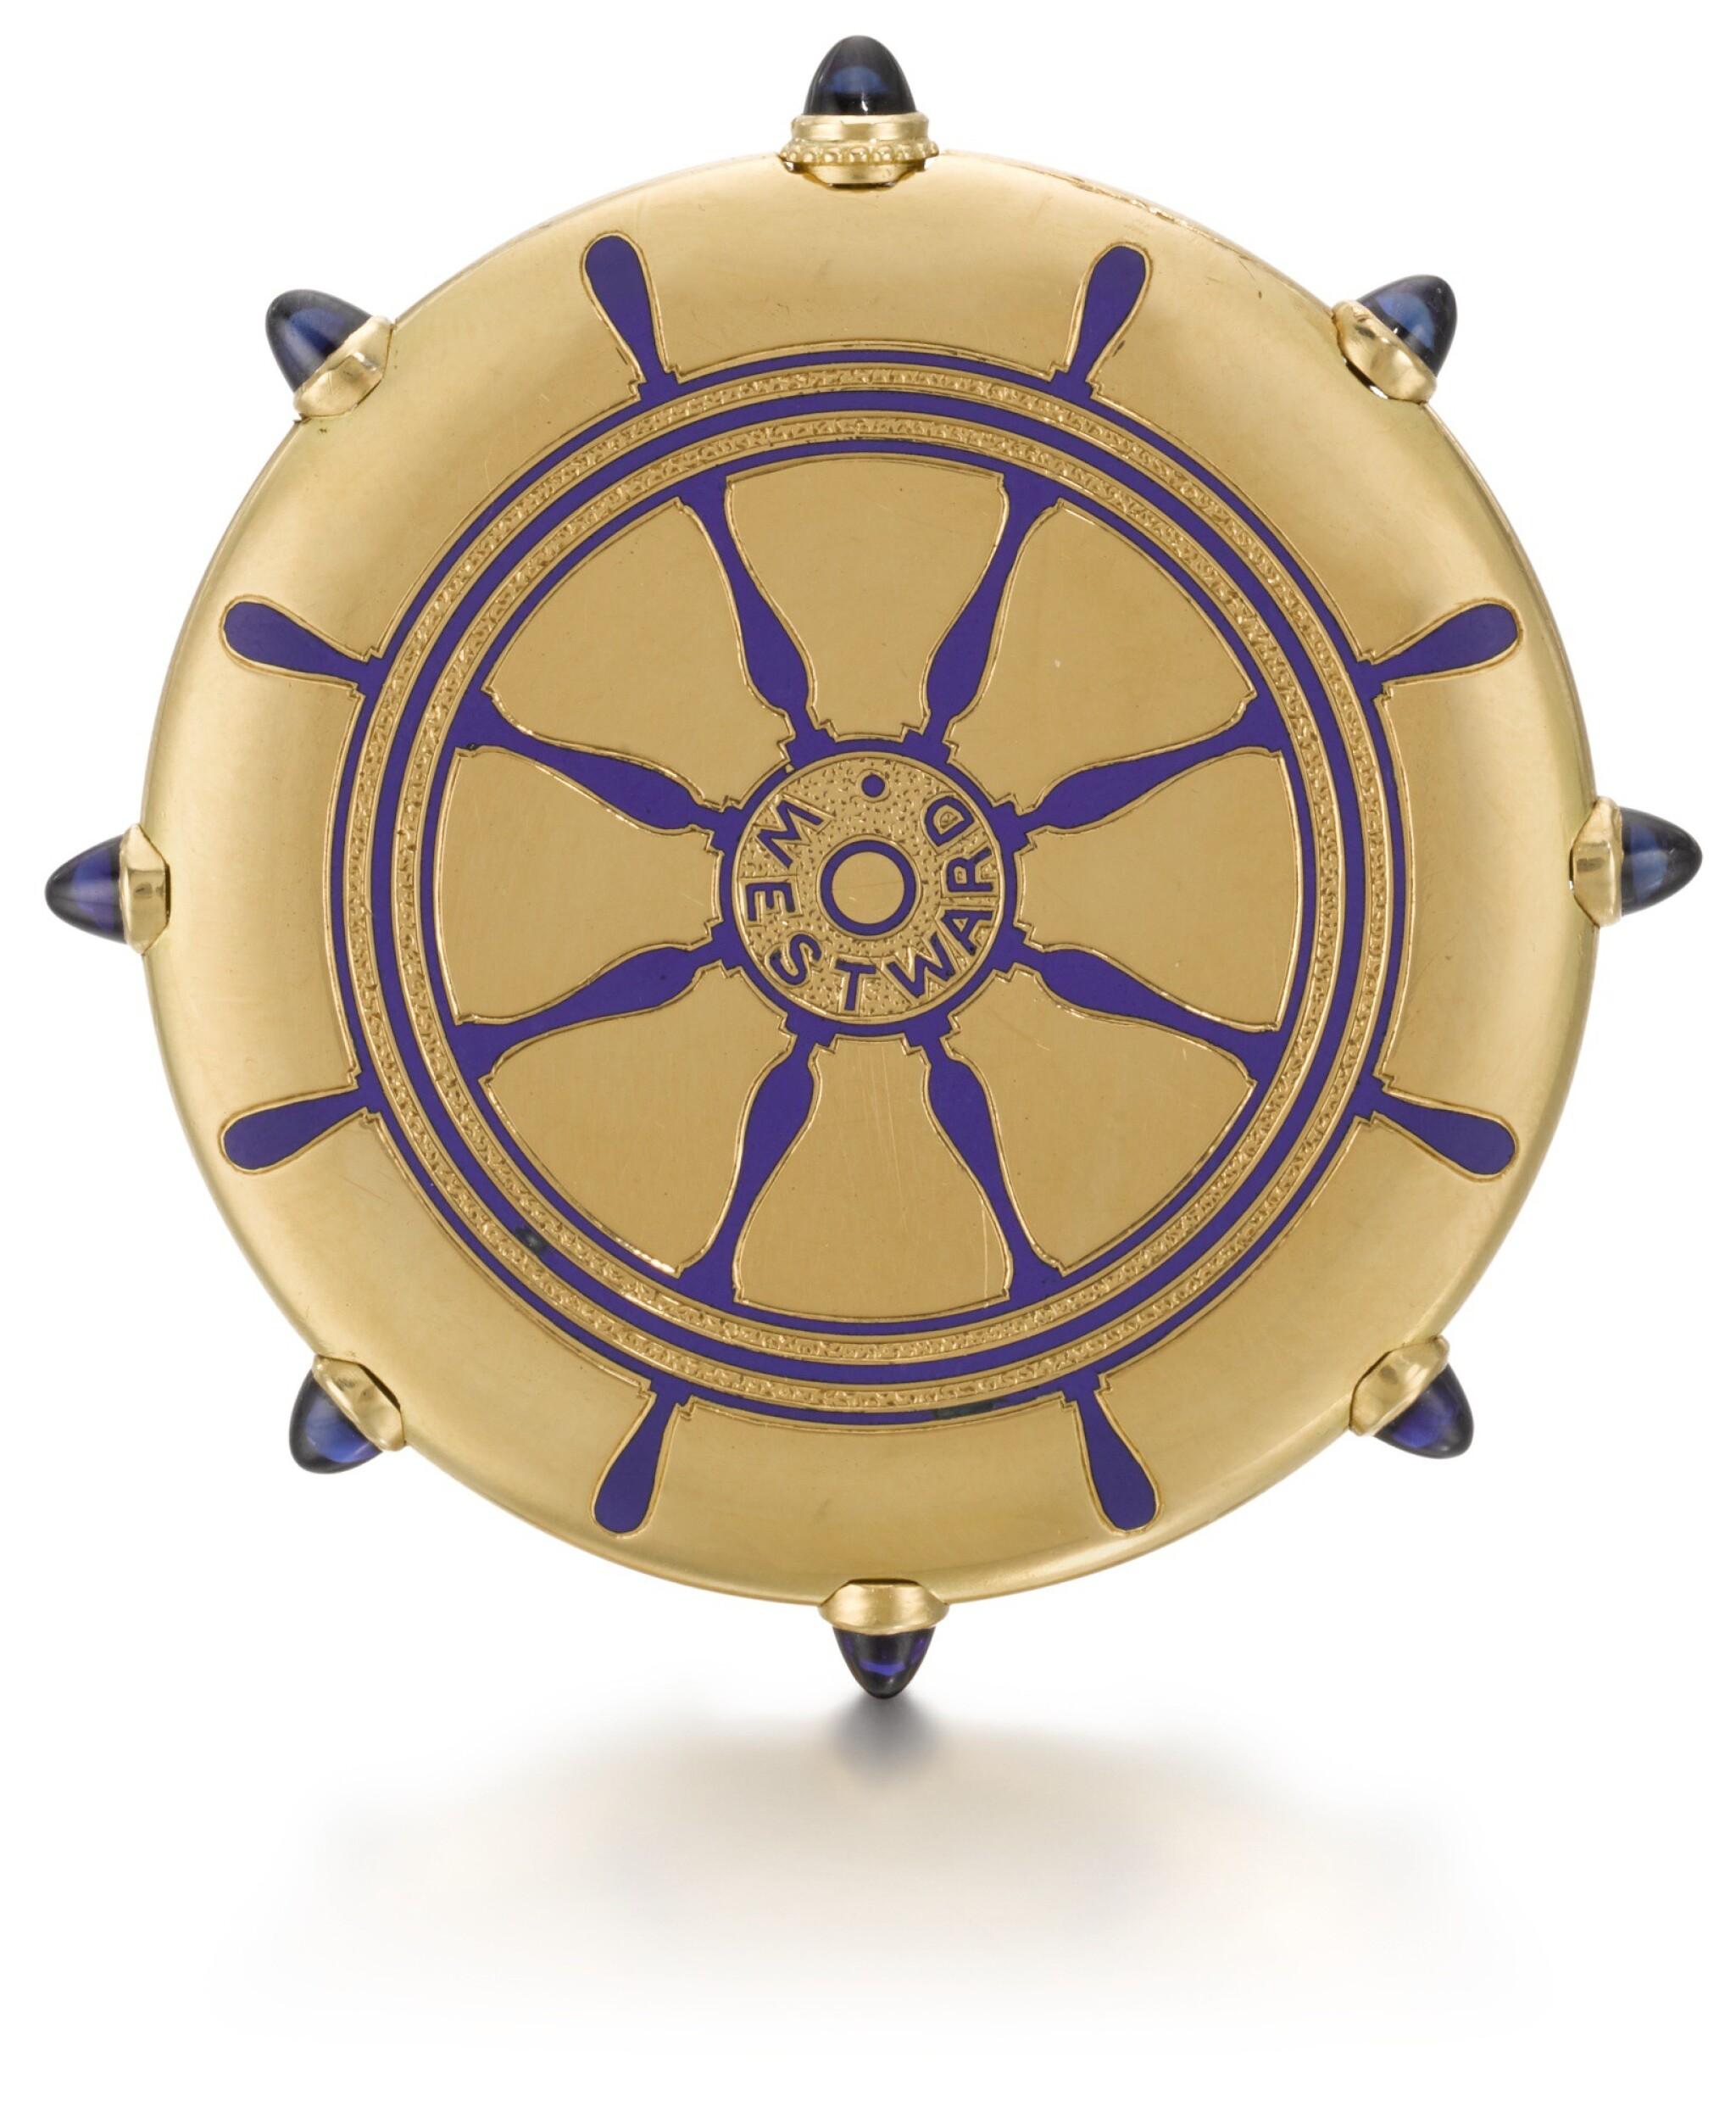 View full screen - View 1 of Lot 76. CARTIER, PARIS   [卡地亞,巴黎]    A GOLD AND ENAMEL KEYLESS OPEN-FACED WATCH IN THE SHAPE OF A SHIP'S WHEEL TO COMMEMORATE THE SUCCESS OF THE AMERICAN RACING SCHOONER WESTWARD AT THE 1910 KIEL REGATTA  CIRCA 1910   [黃金畫琺瑯船輪形懷錶,為紀念美國Westward縱帆快艇勝出1910年Regatta帆船賽製造,年份約1910].